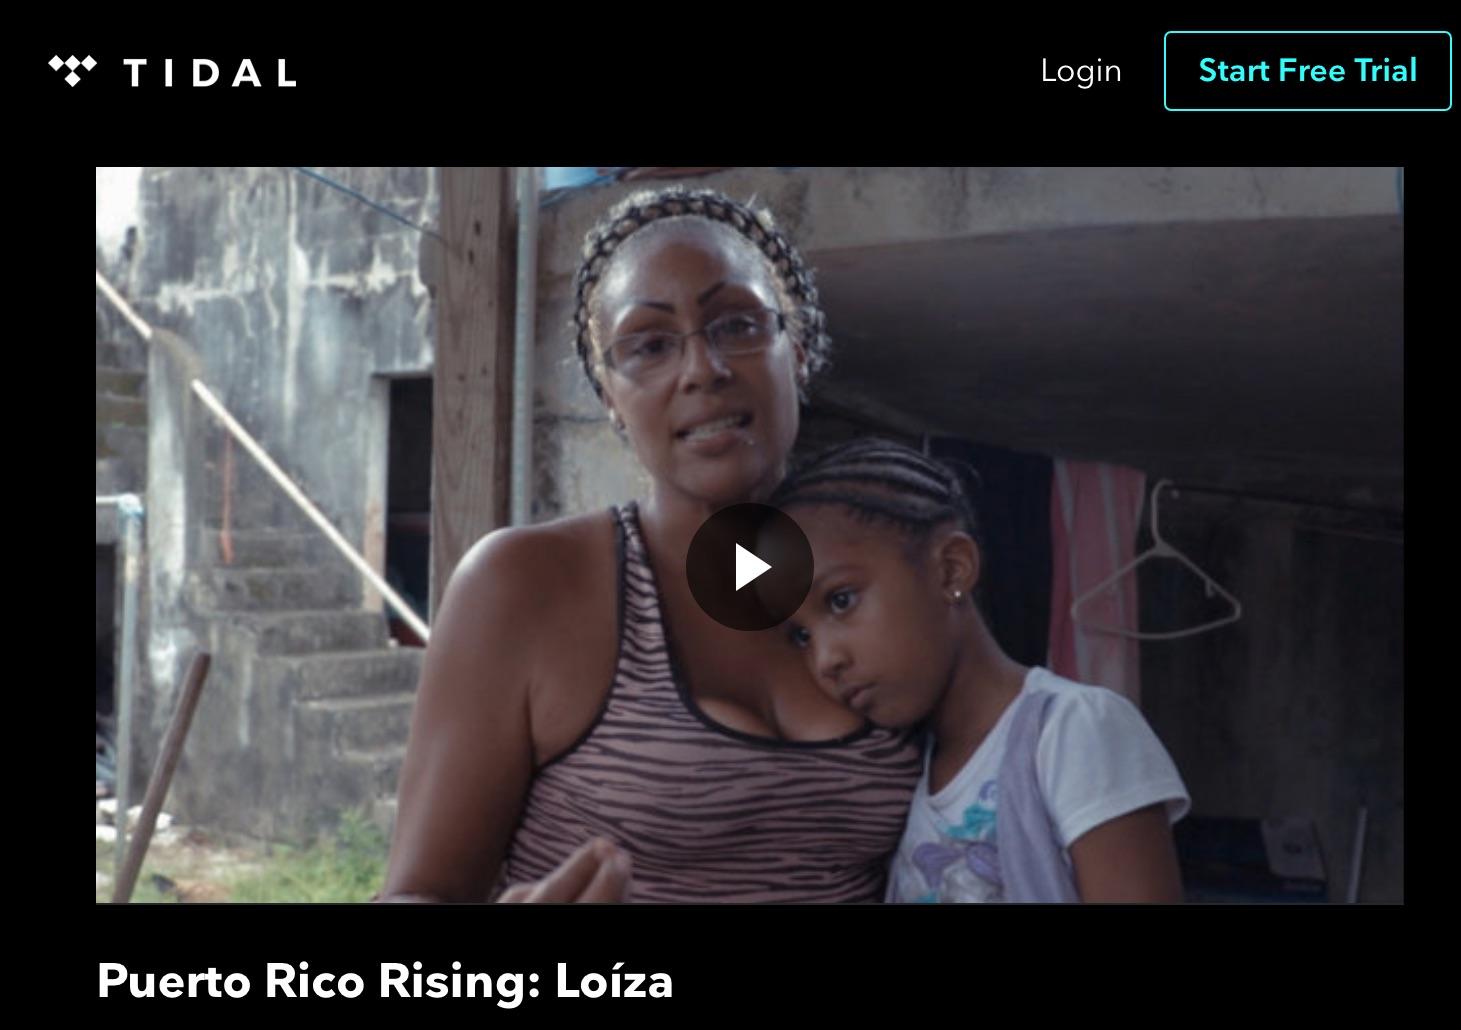 TIDAL - Puerto Rico Rising Videographer